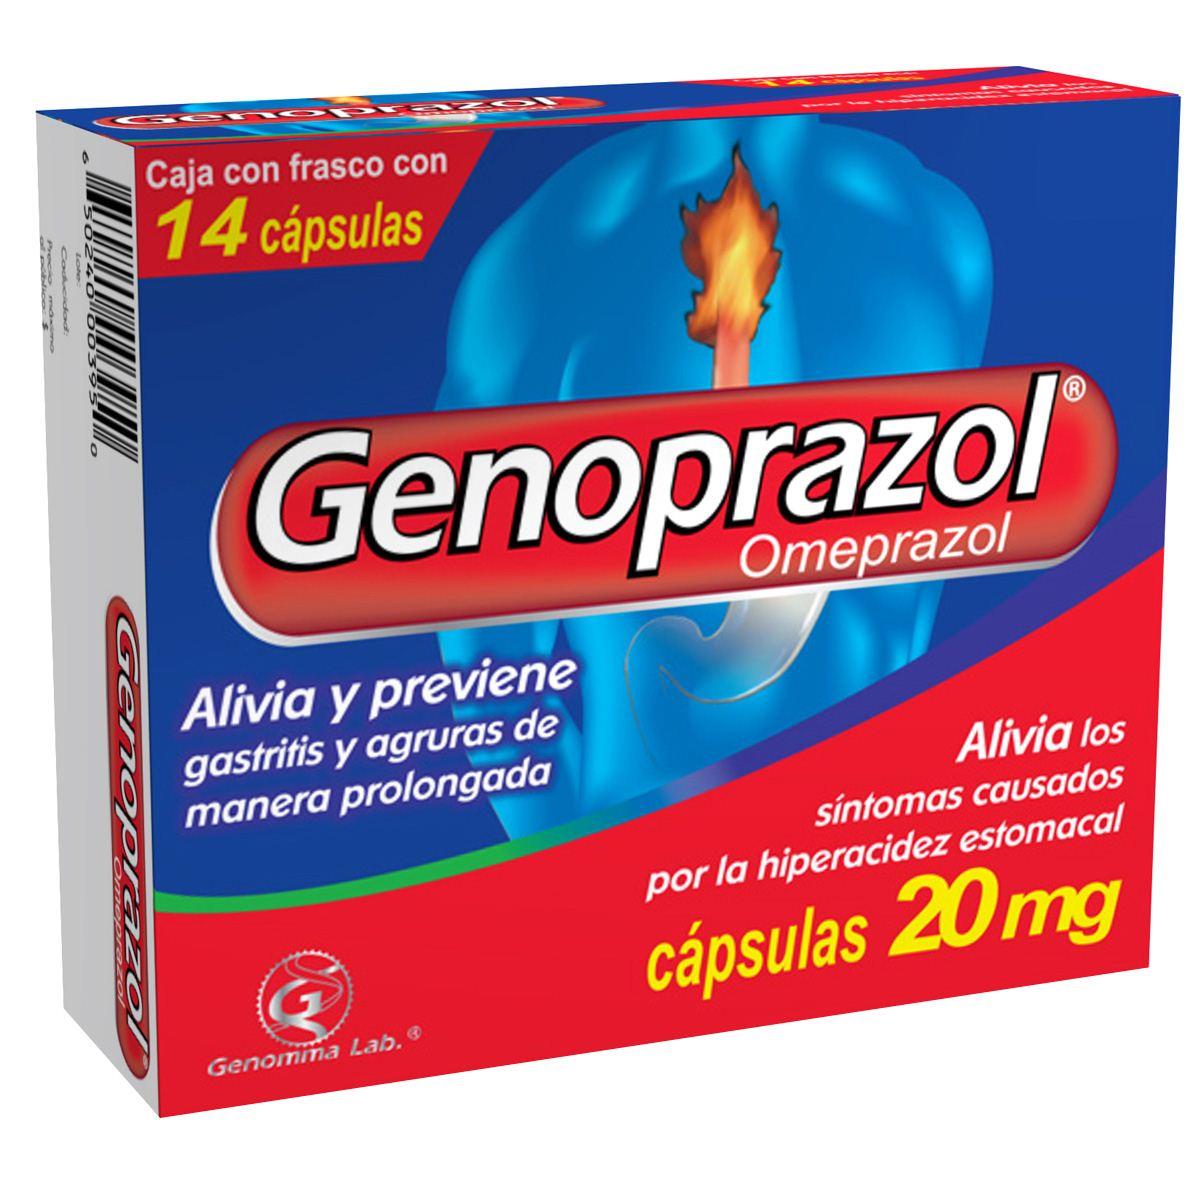 Genoprazol cápsula  - Sanborns